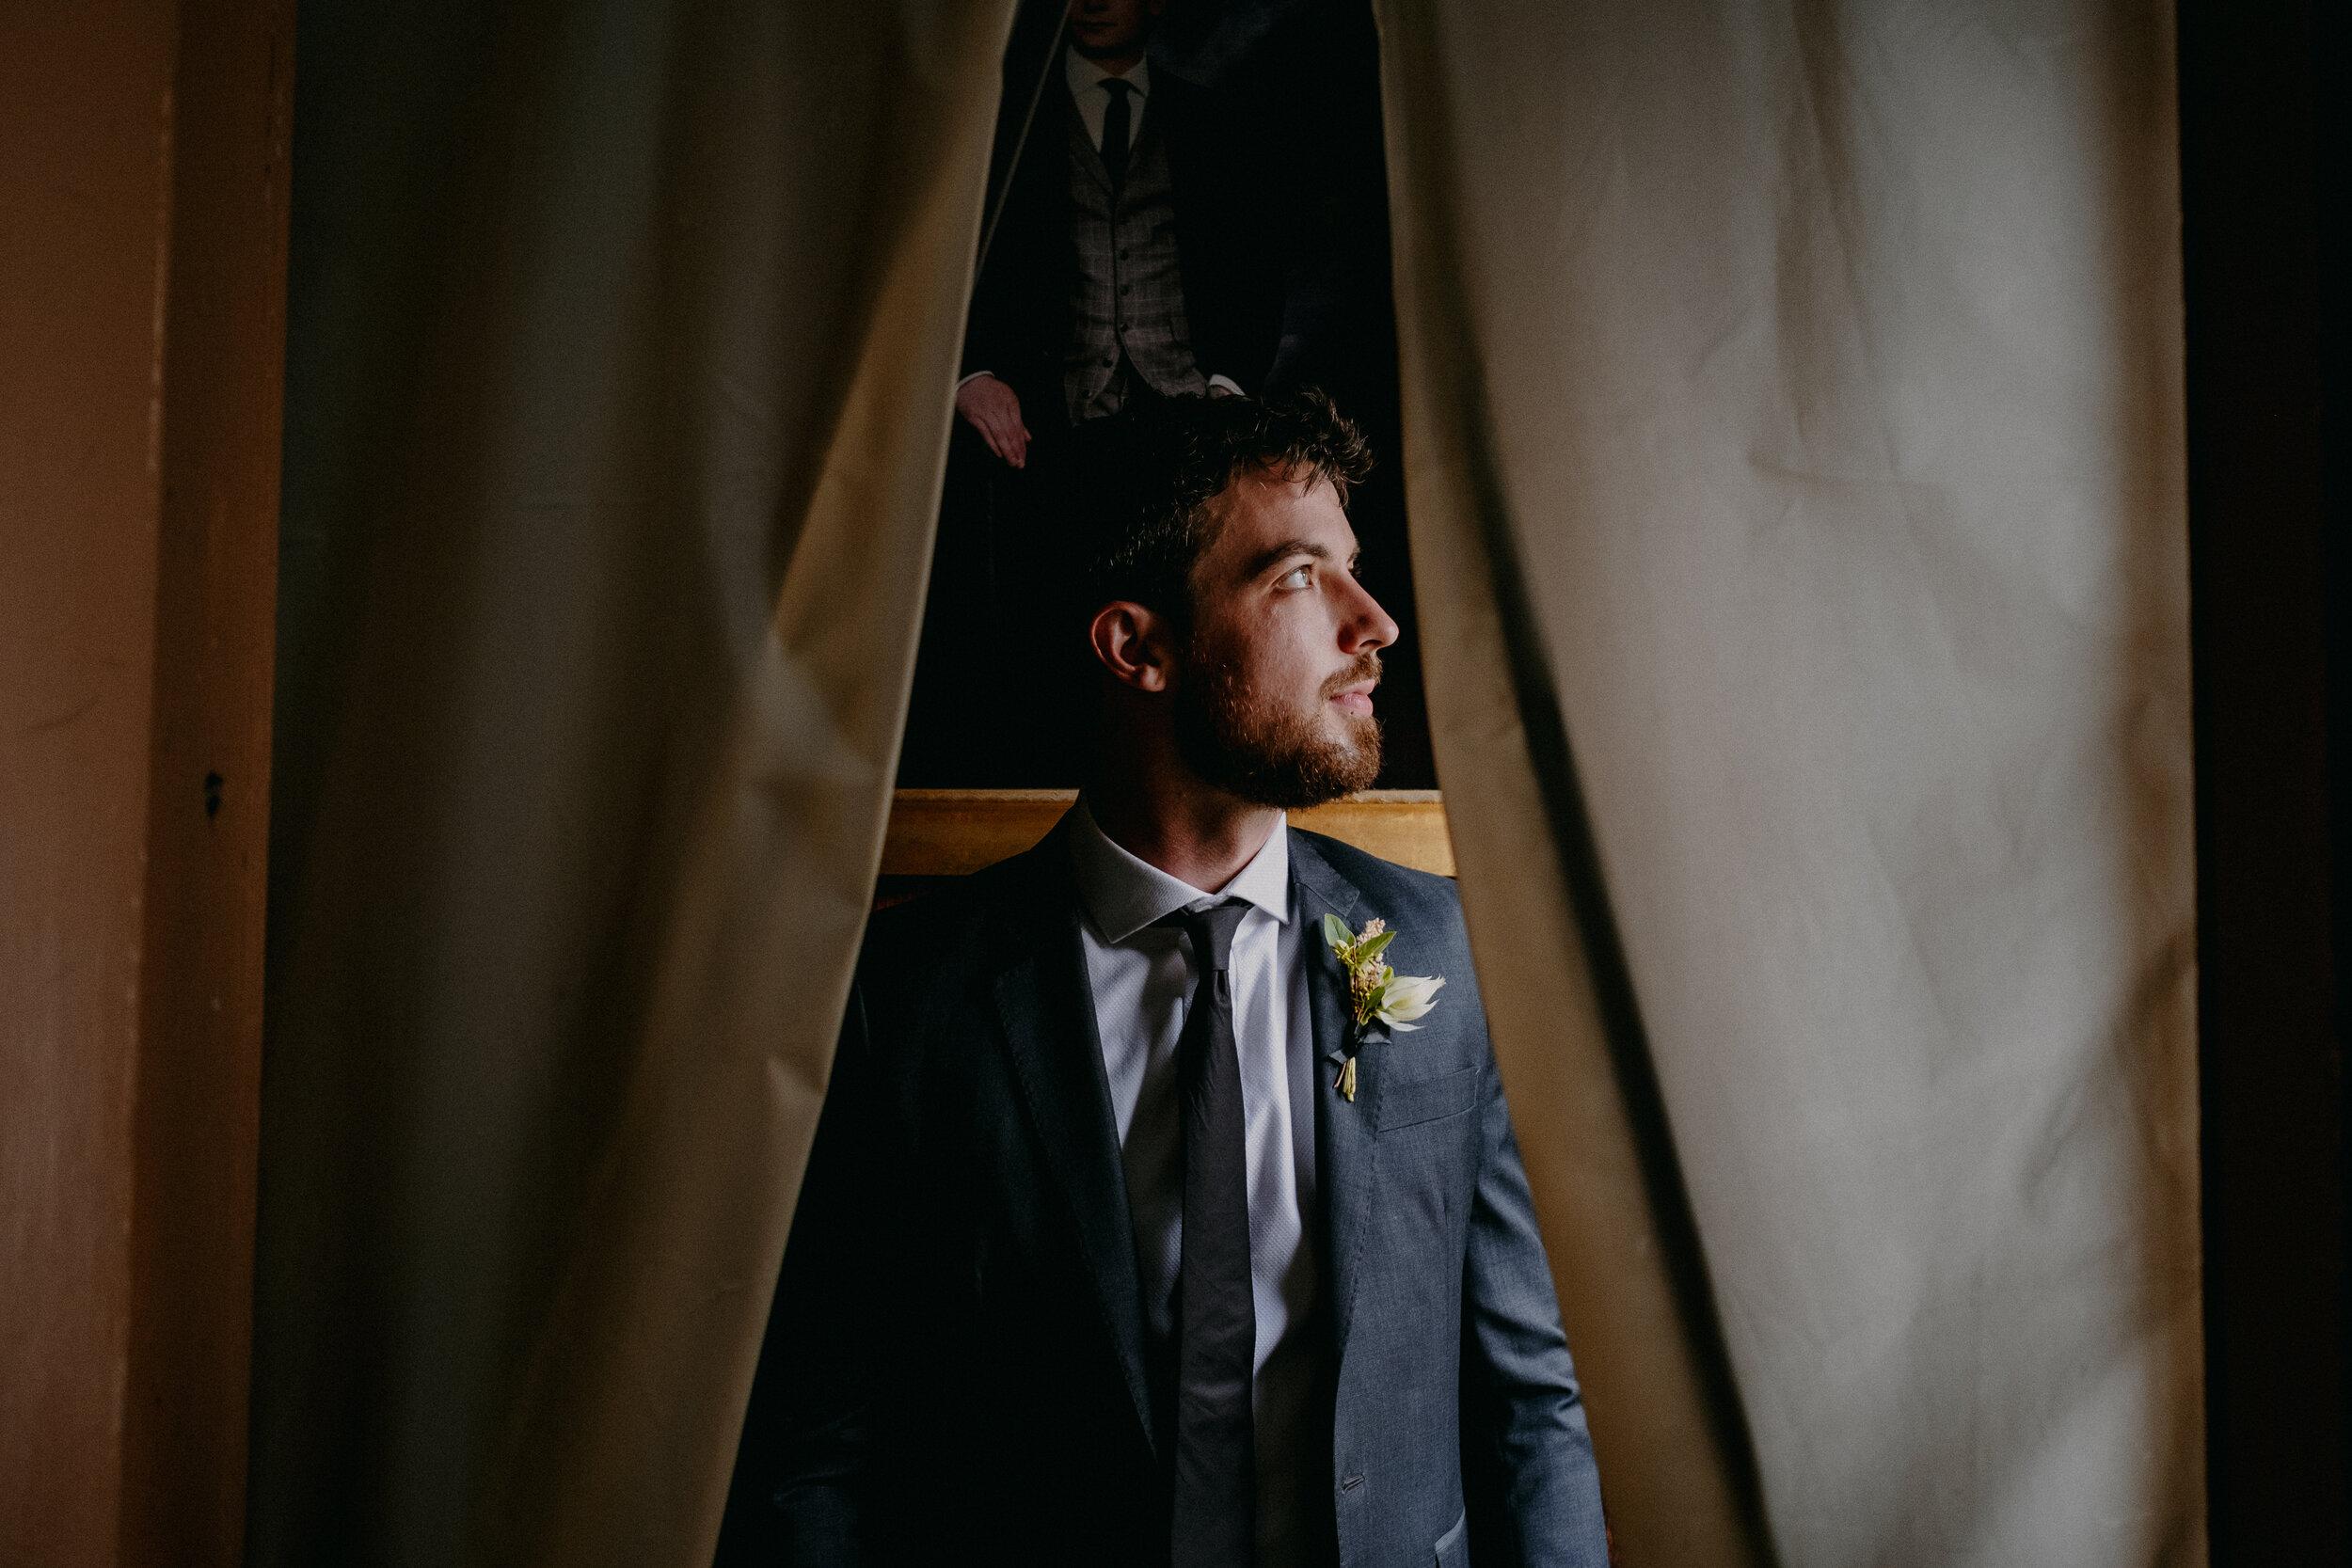 Aurora_Brooklyn_Wedding_Photographer_Chellise_Michael_Photography-26.jpg